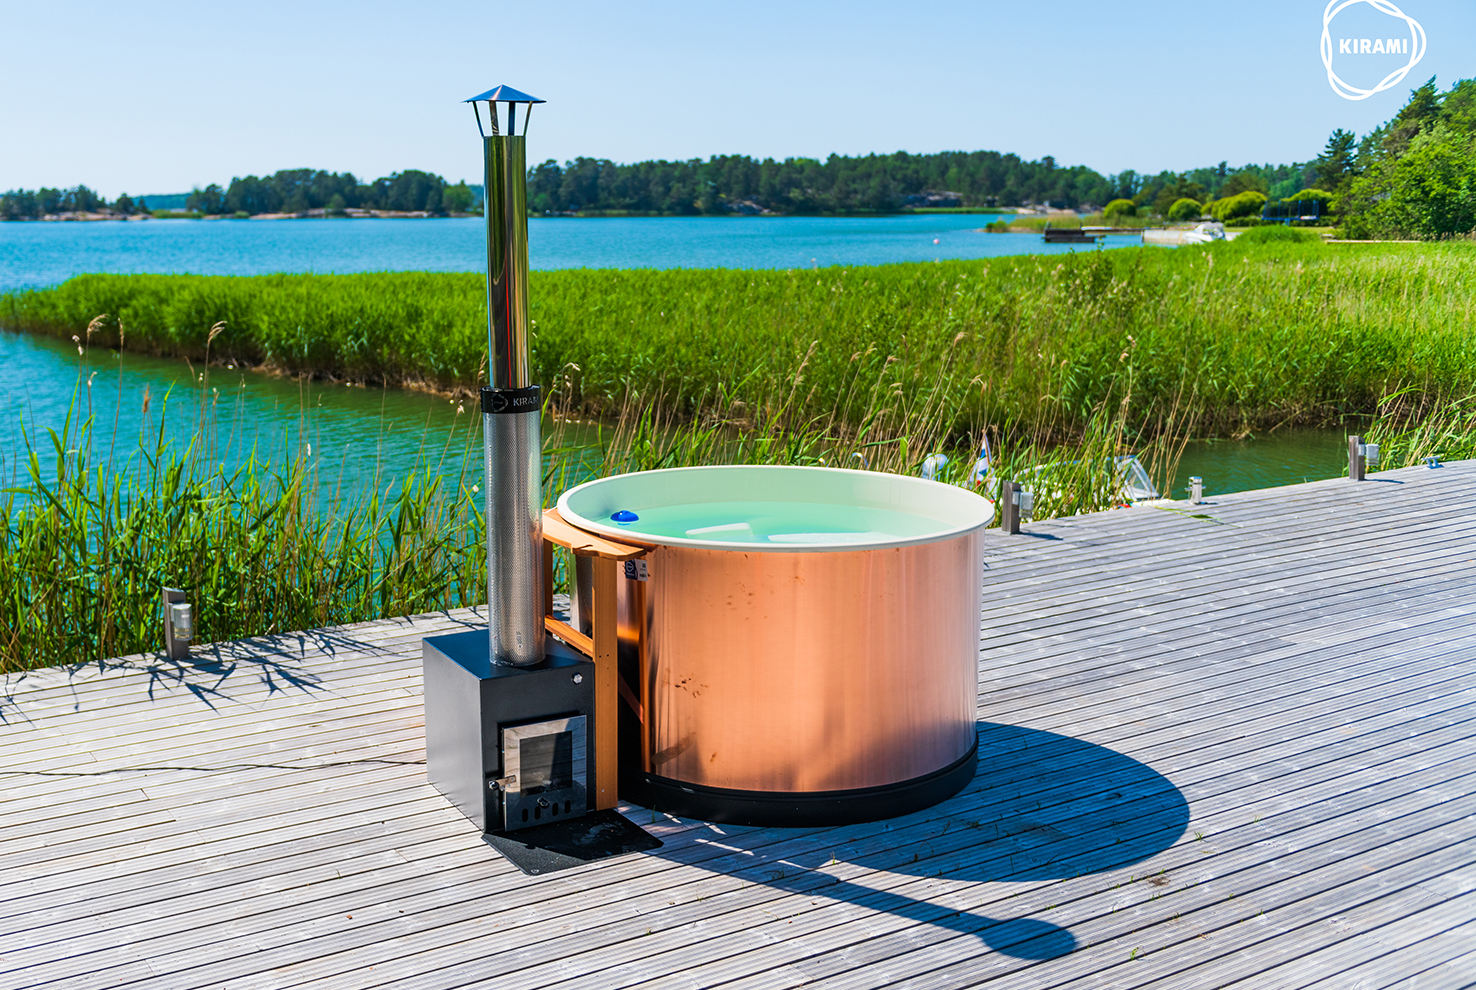 Pearly bain nordique eaufeeling